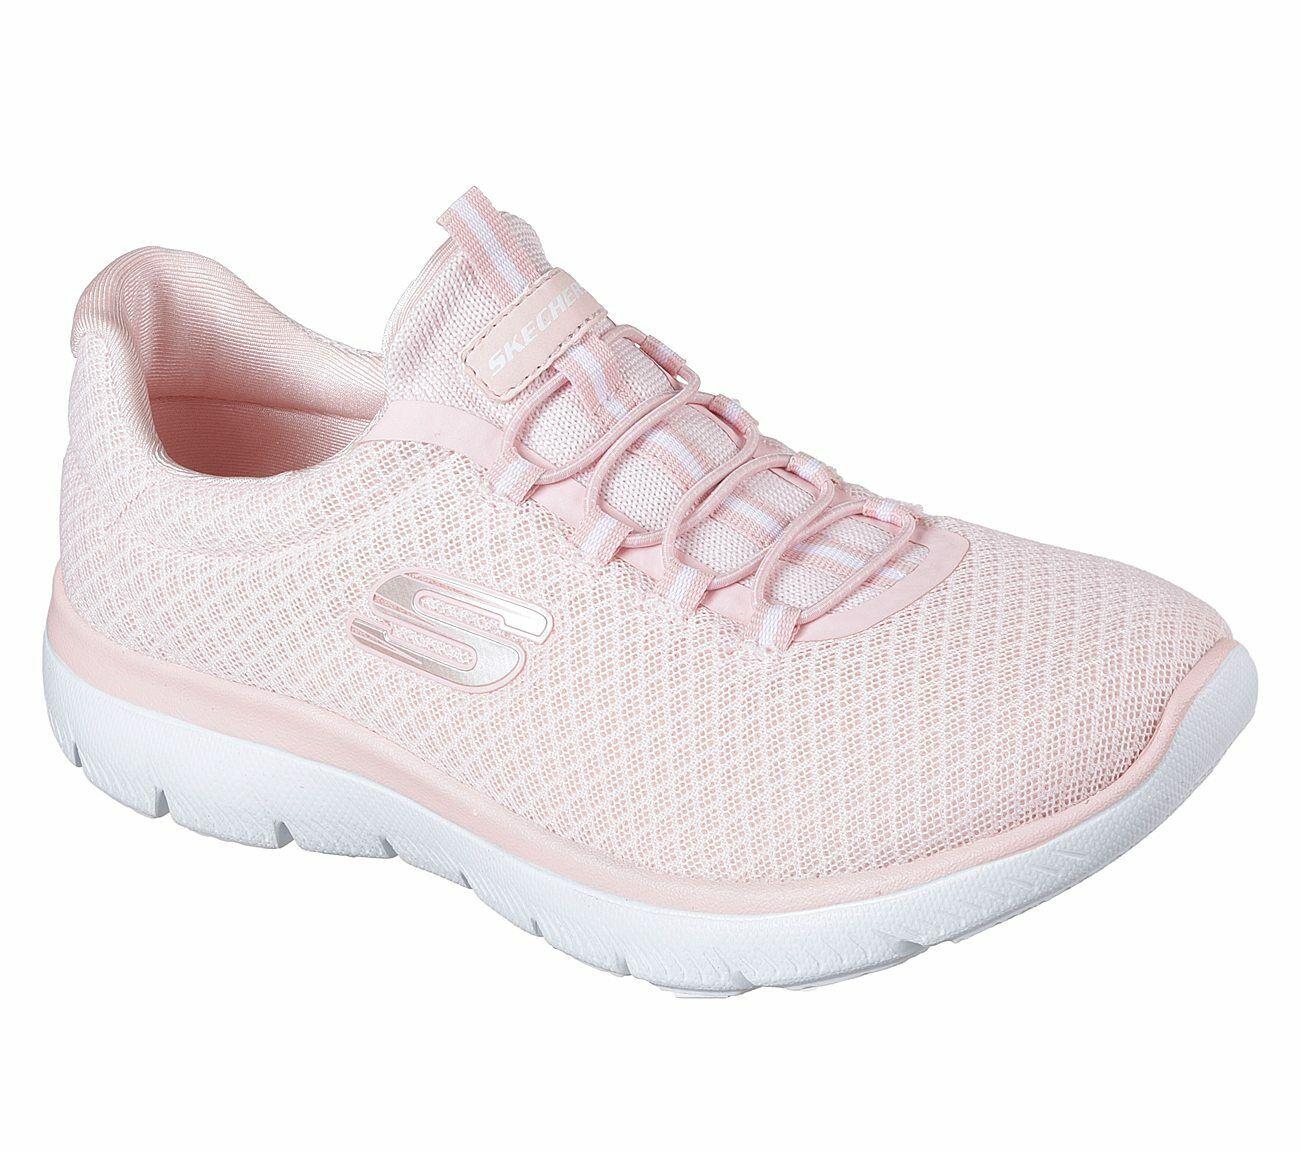 NEU SKECHERS Damen Sneakers Turnschuhe Training Sport Walking SUMMITS Pink